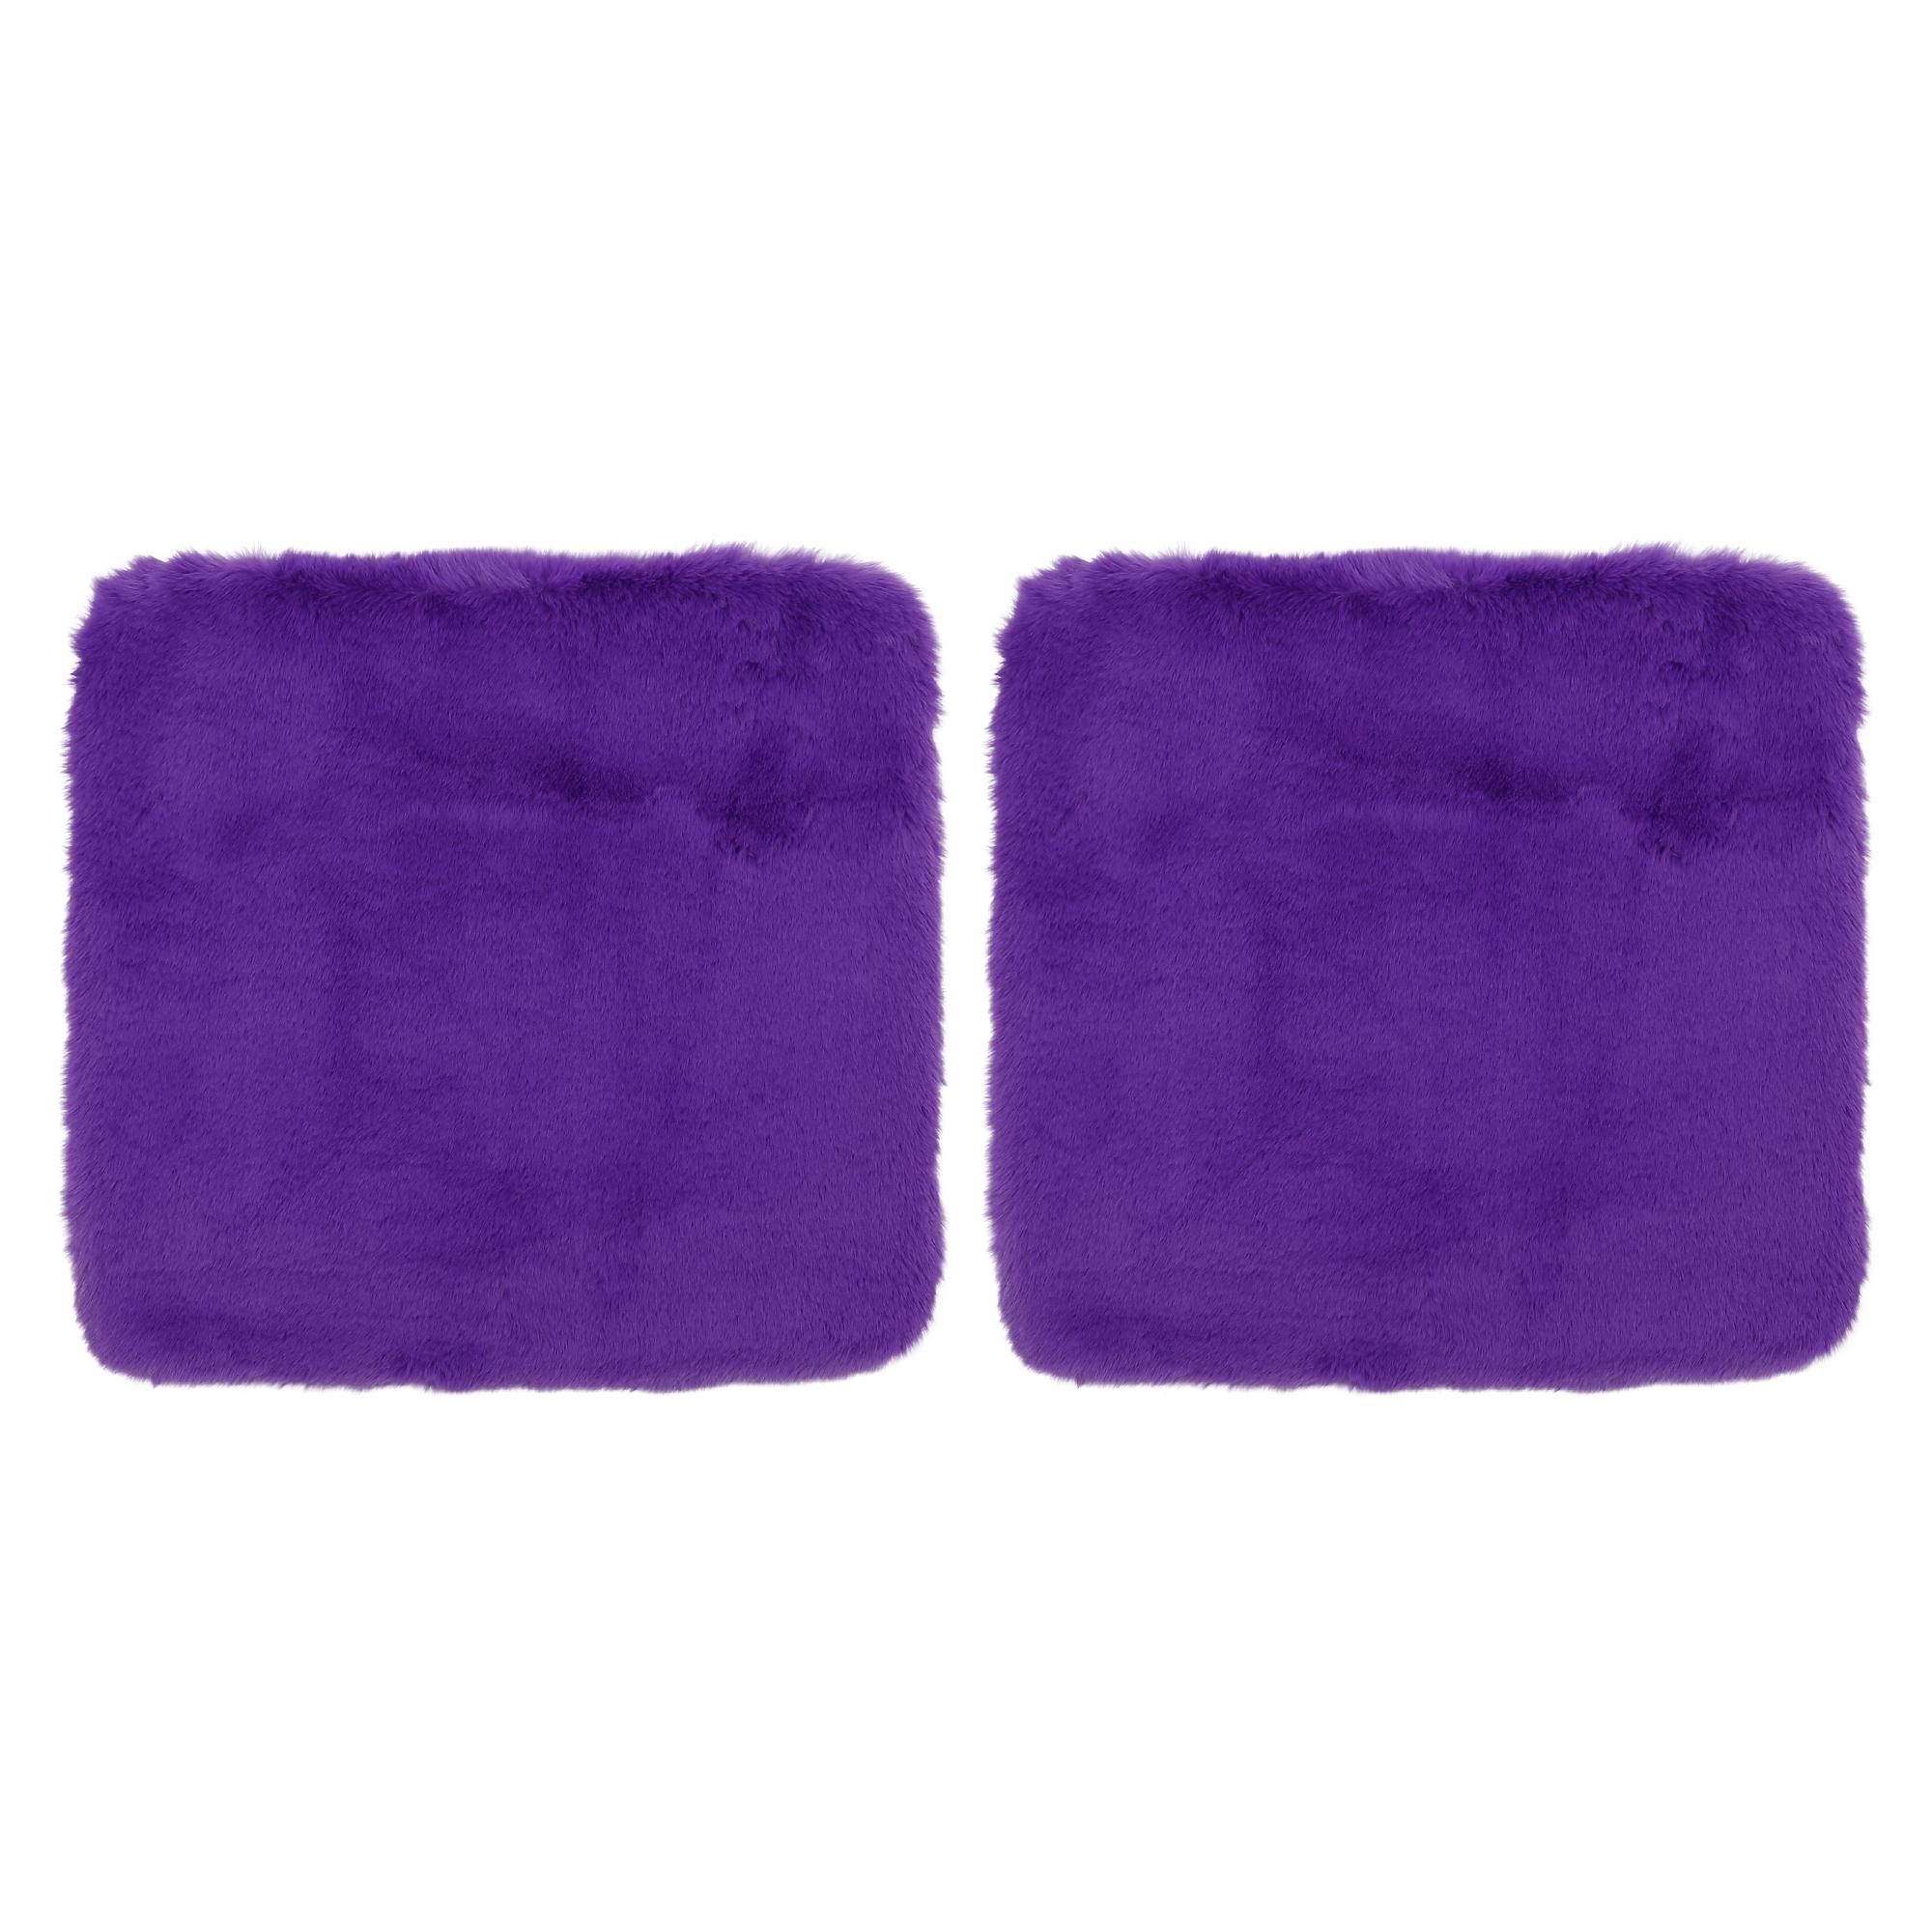 2pcs Universal Auto Soft Faux Plush Cushion Warm Interior Seat Cover Pad Purple